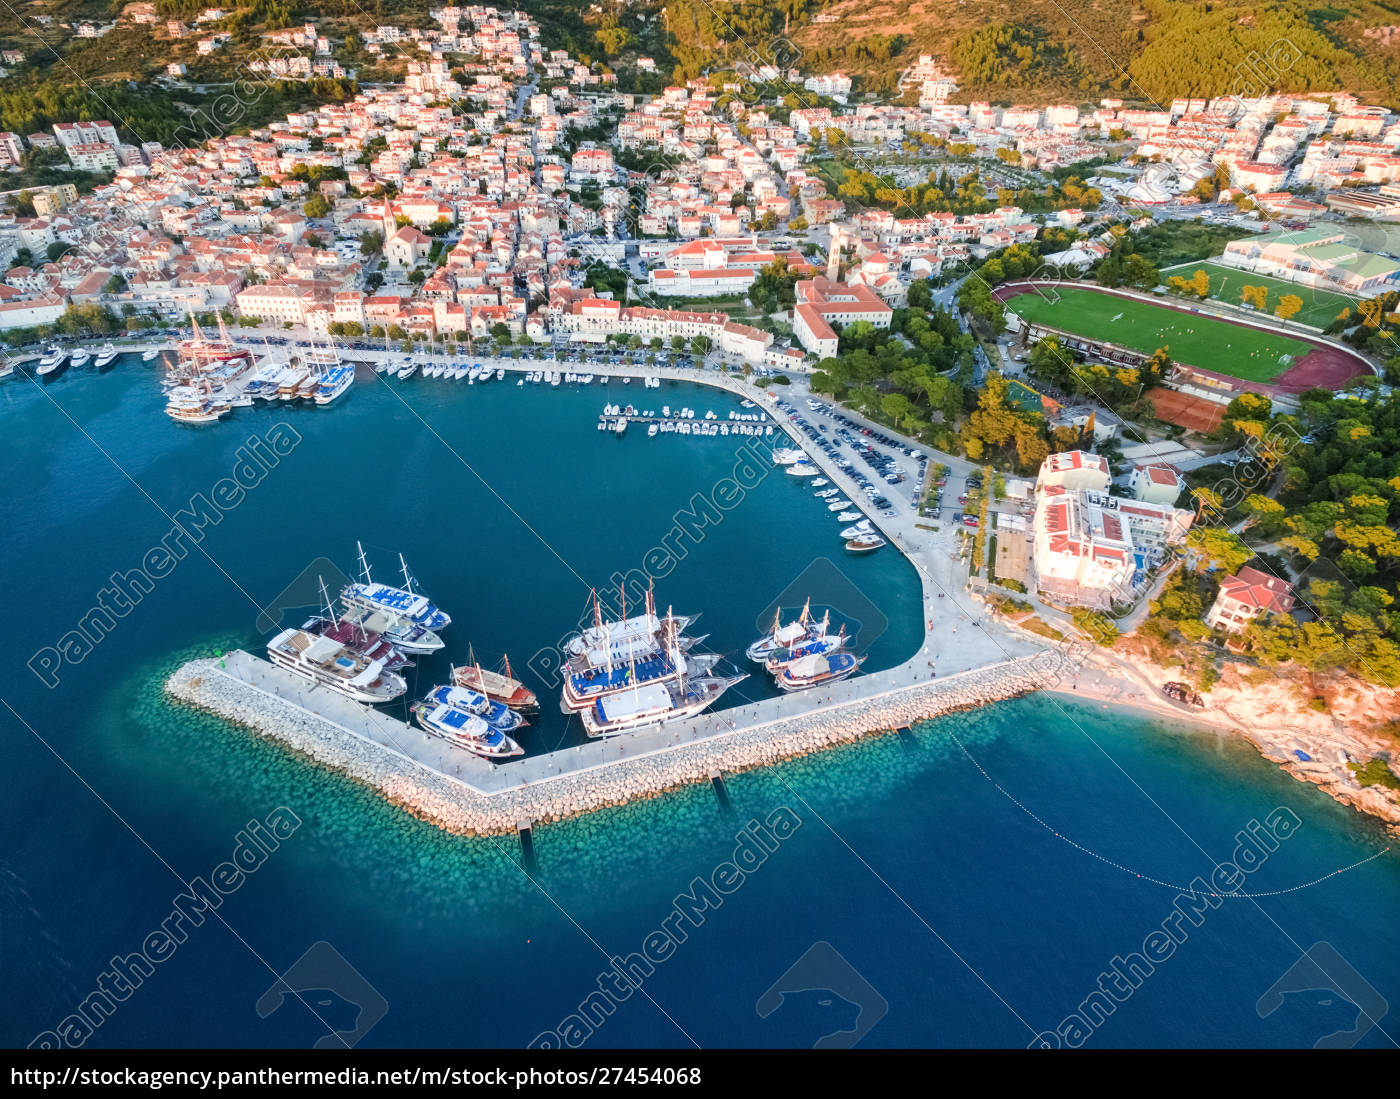 aerial, view, on, makarska, and, marina - 27454068